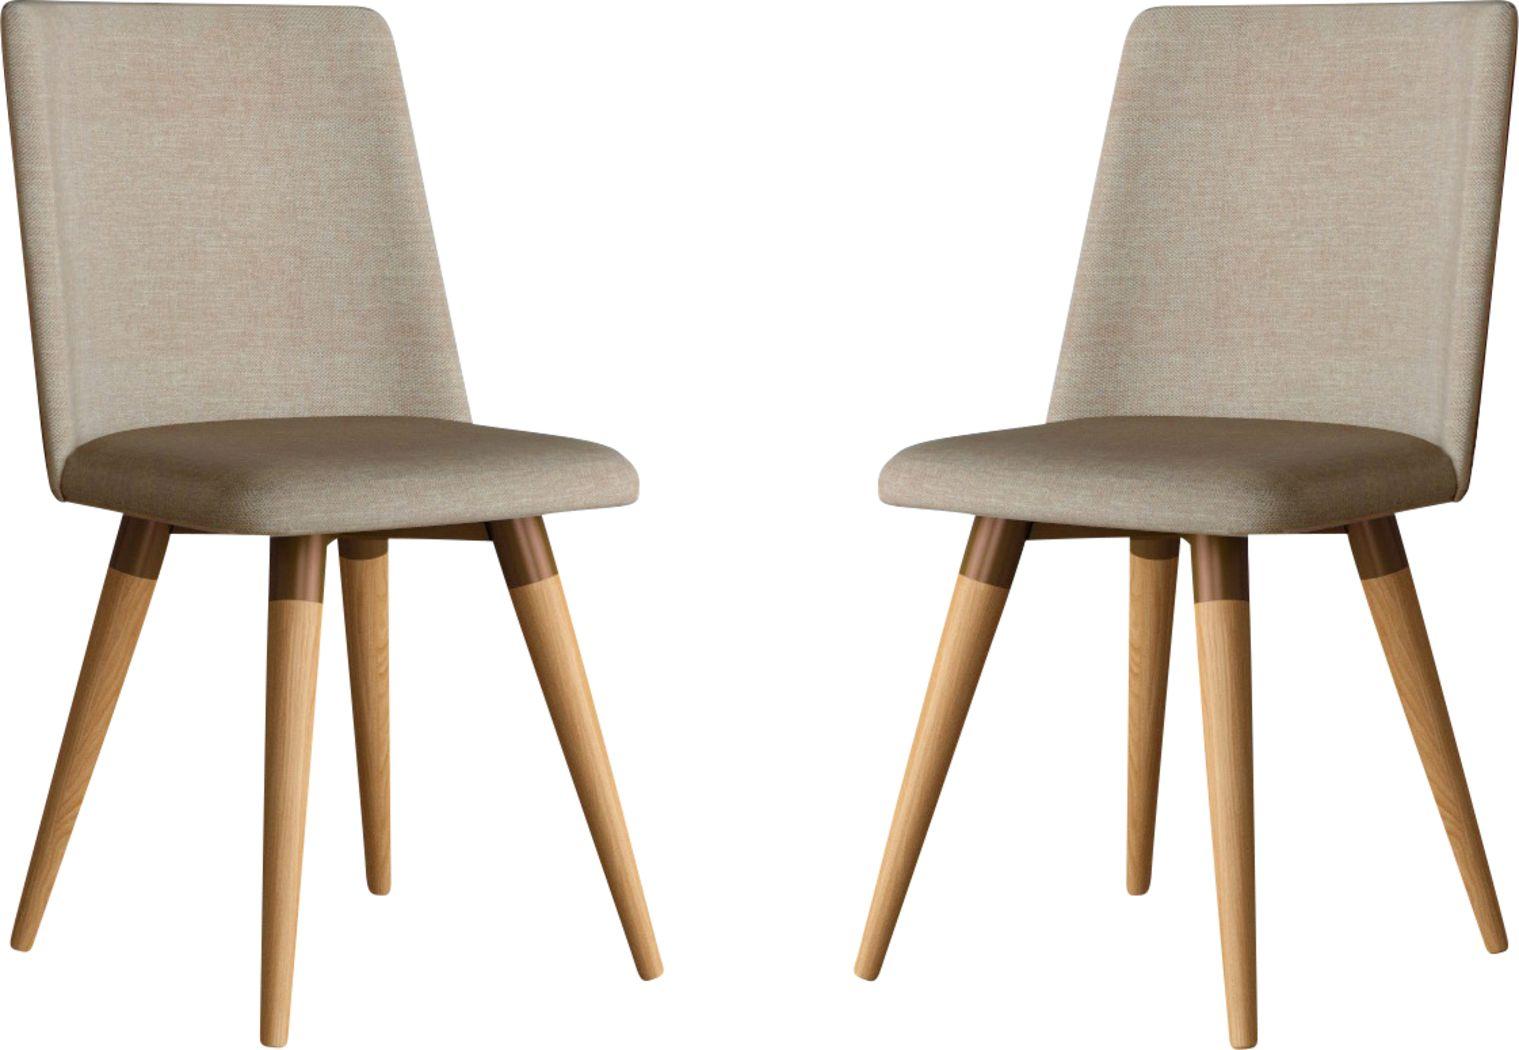 Abita Circle Brown Swivel Side Chair, Set of 2